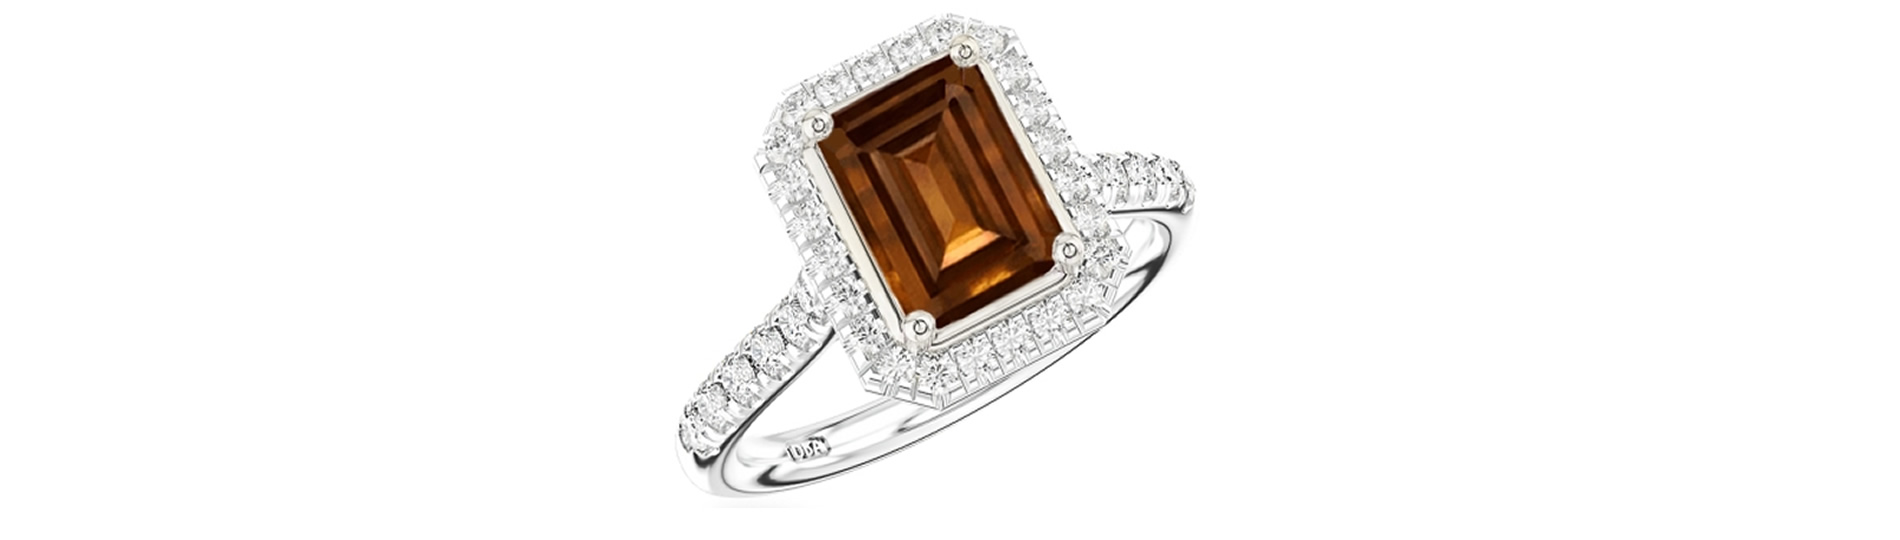 Шоколадный бриллиант